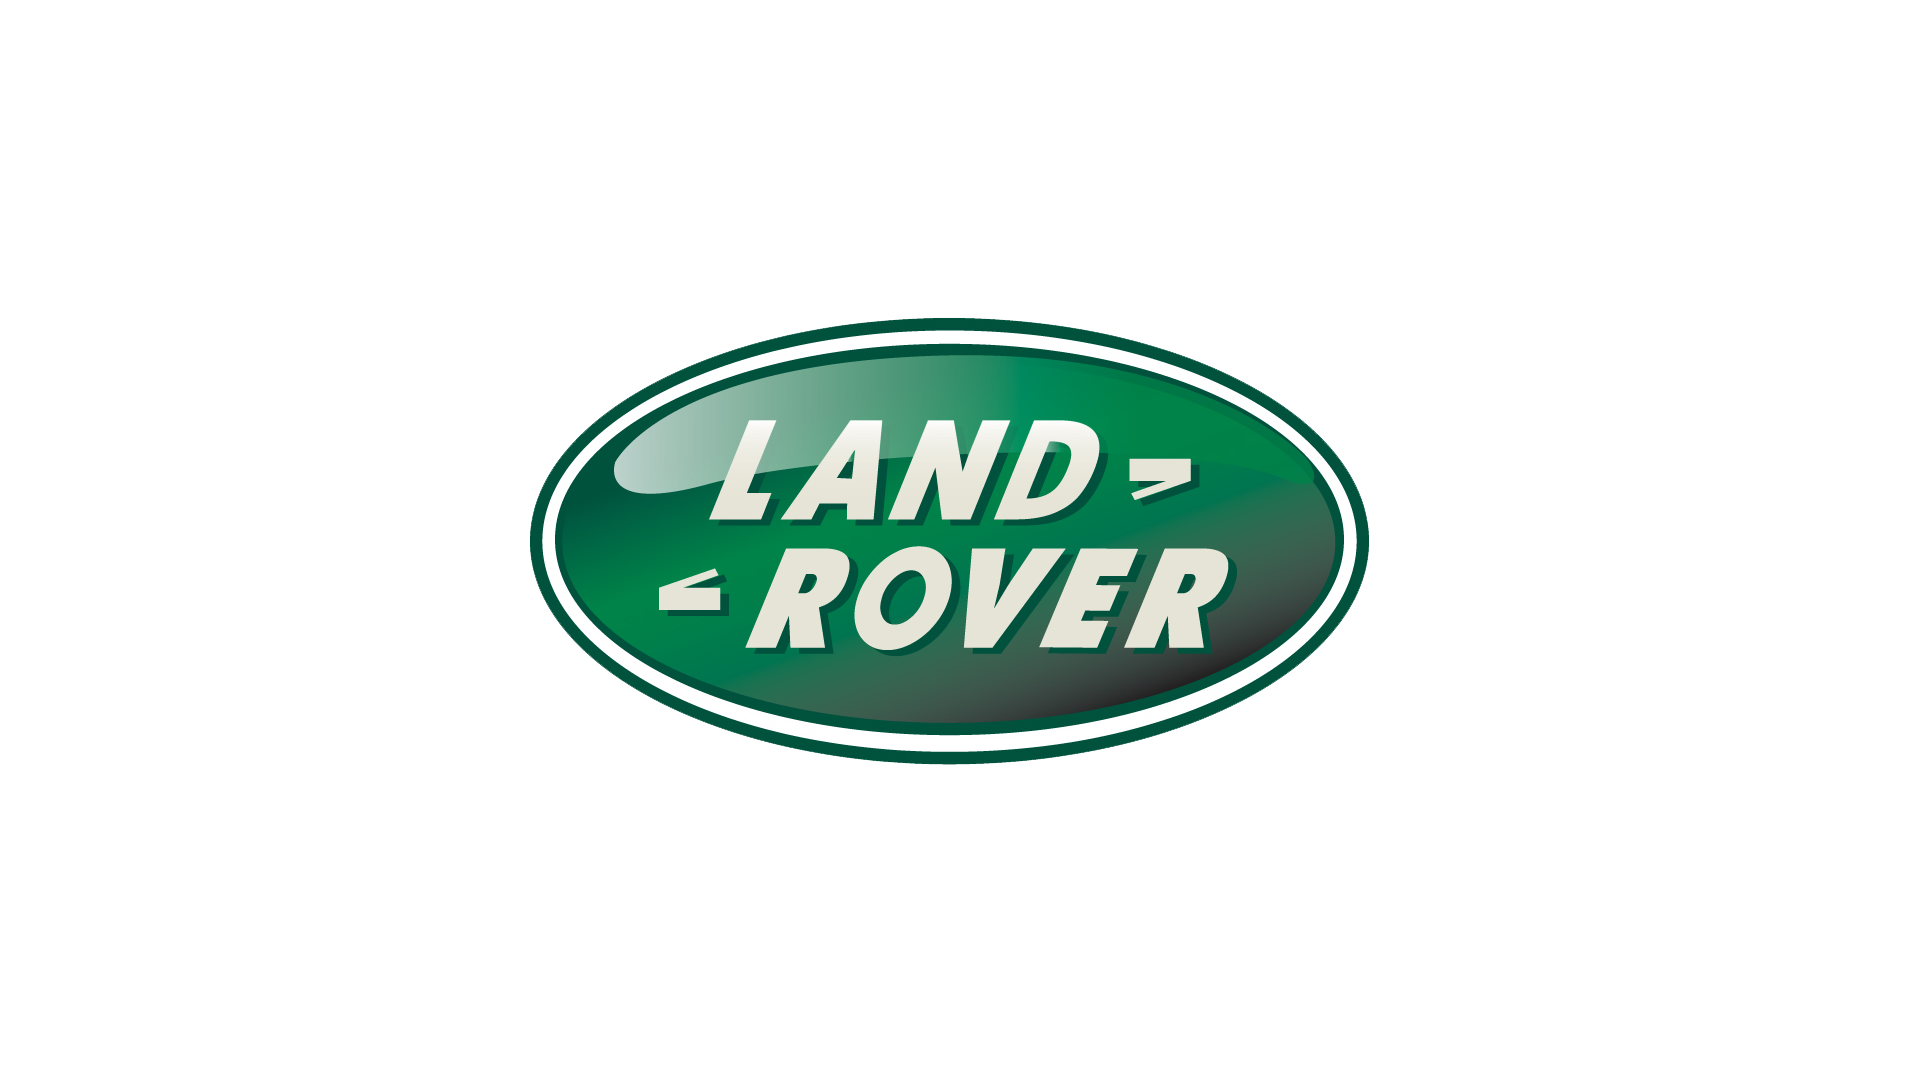 Land Rover Logo (1989) 1920x1080 HD png Land rover